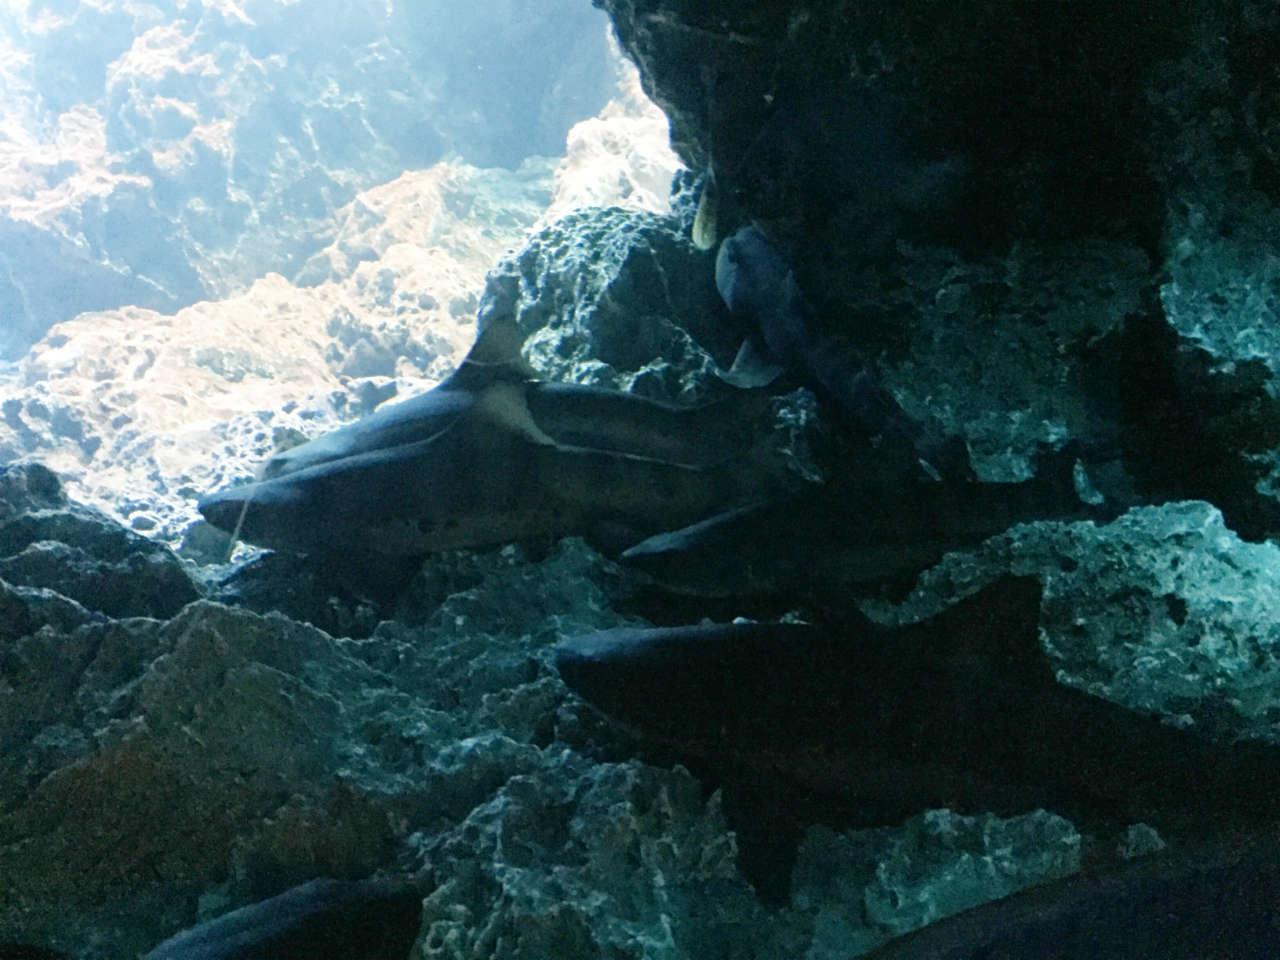 kyoto-aquarium-shark